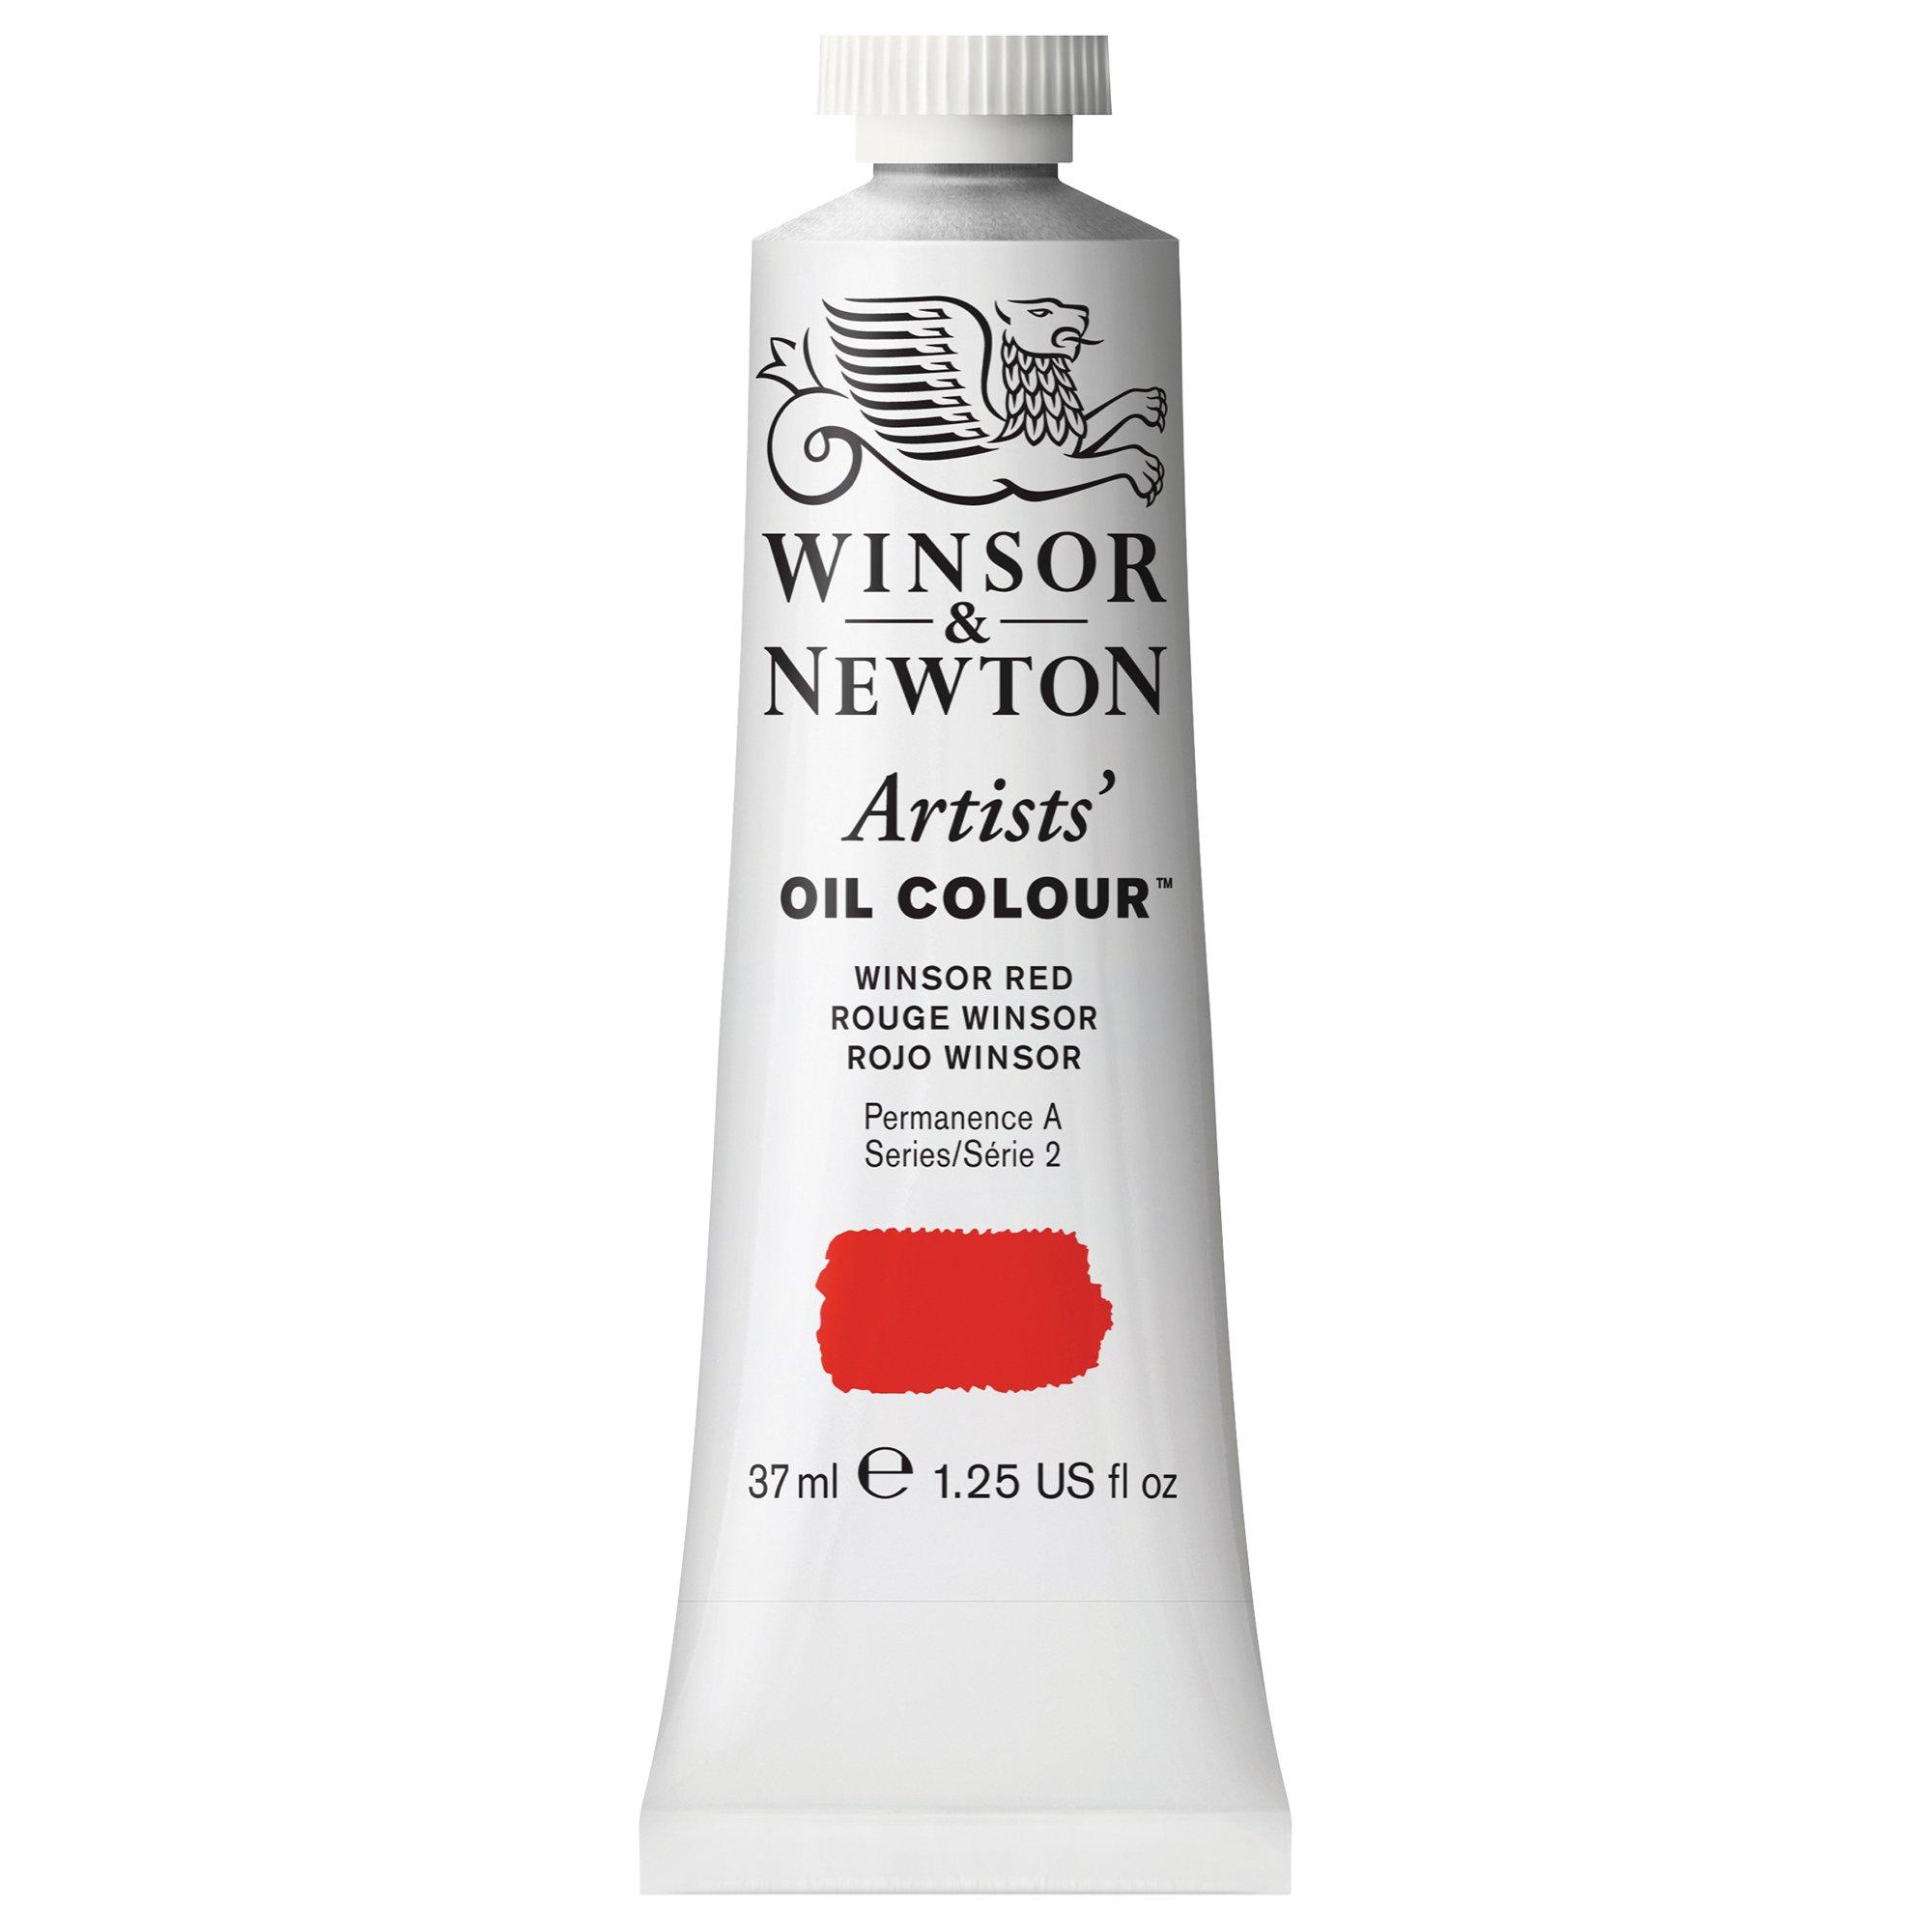 Winsor & Newton Artists' Oil Colour Paint, 37ml Tube, Winsor Red